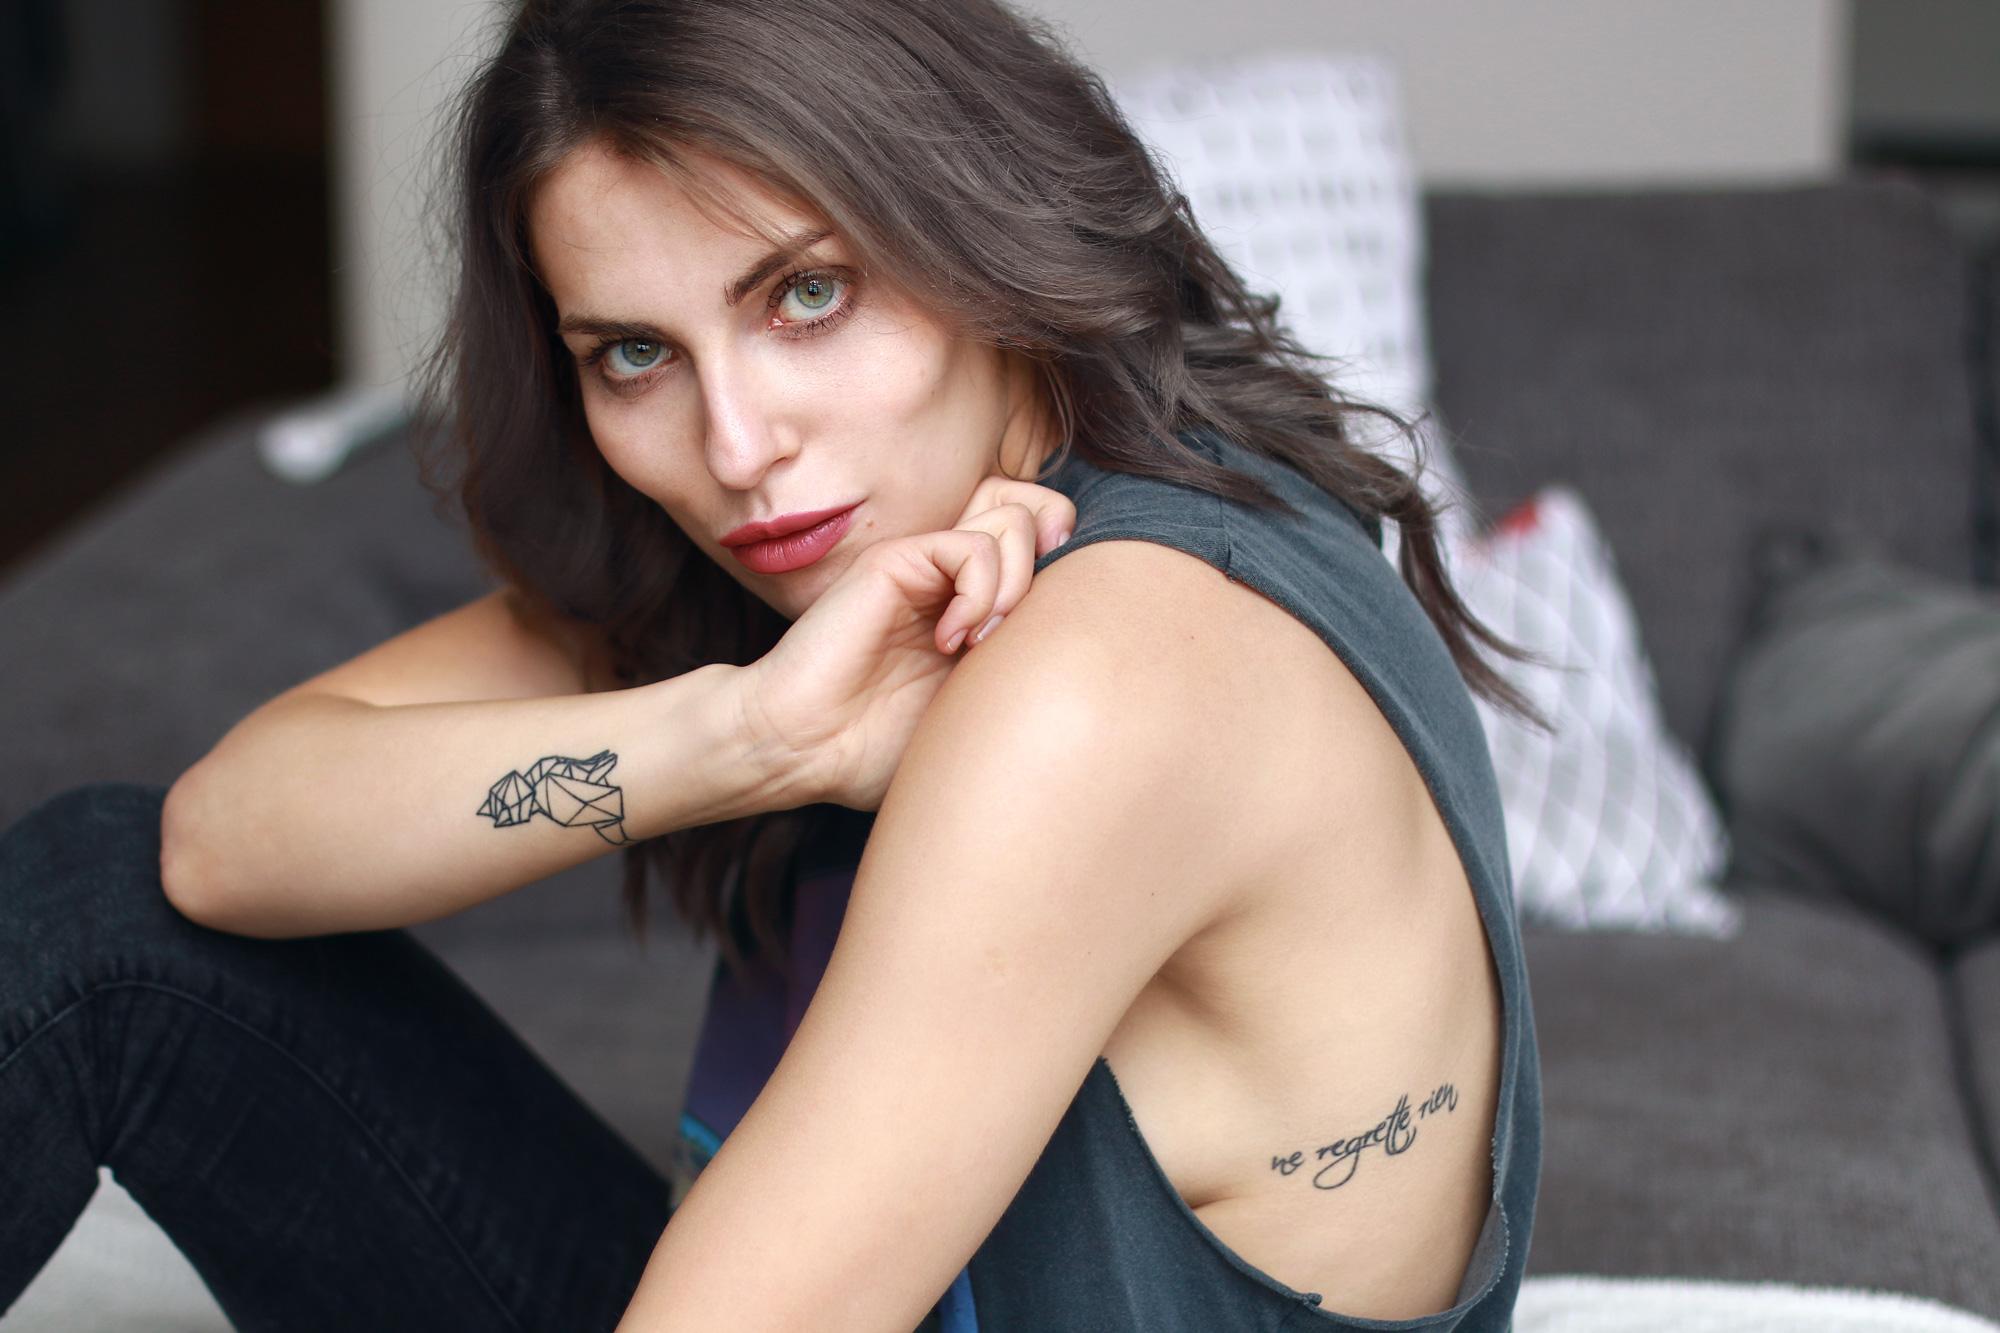 Masha-Sedgwick-tattoos-2